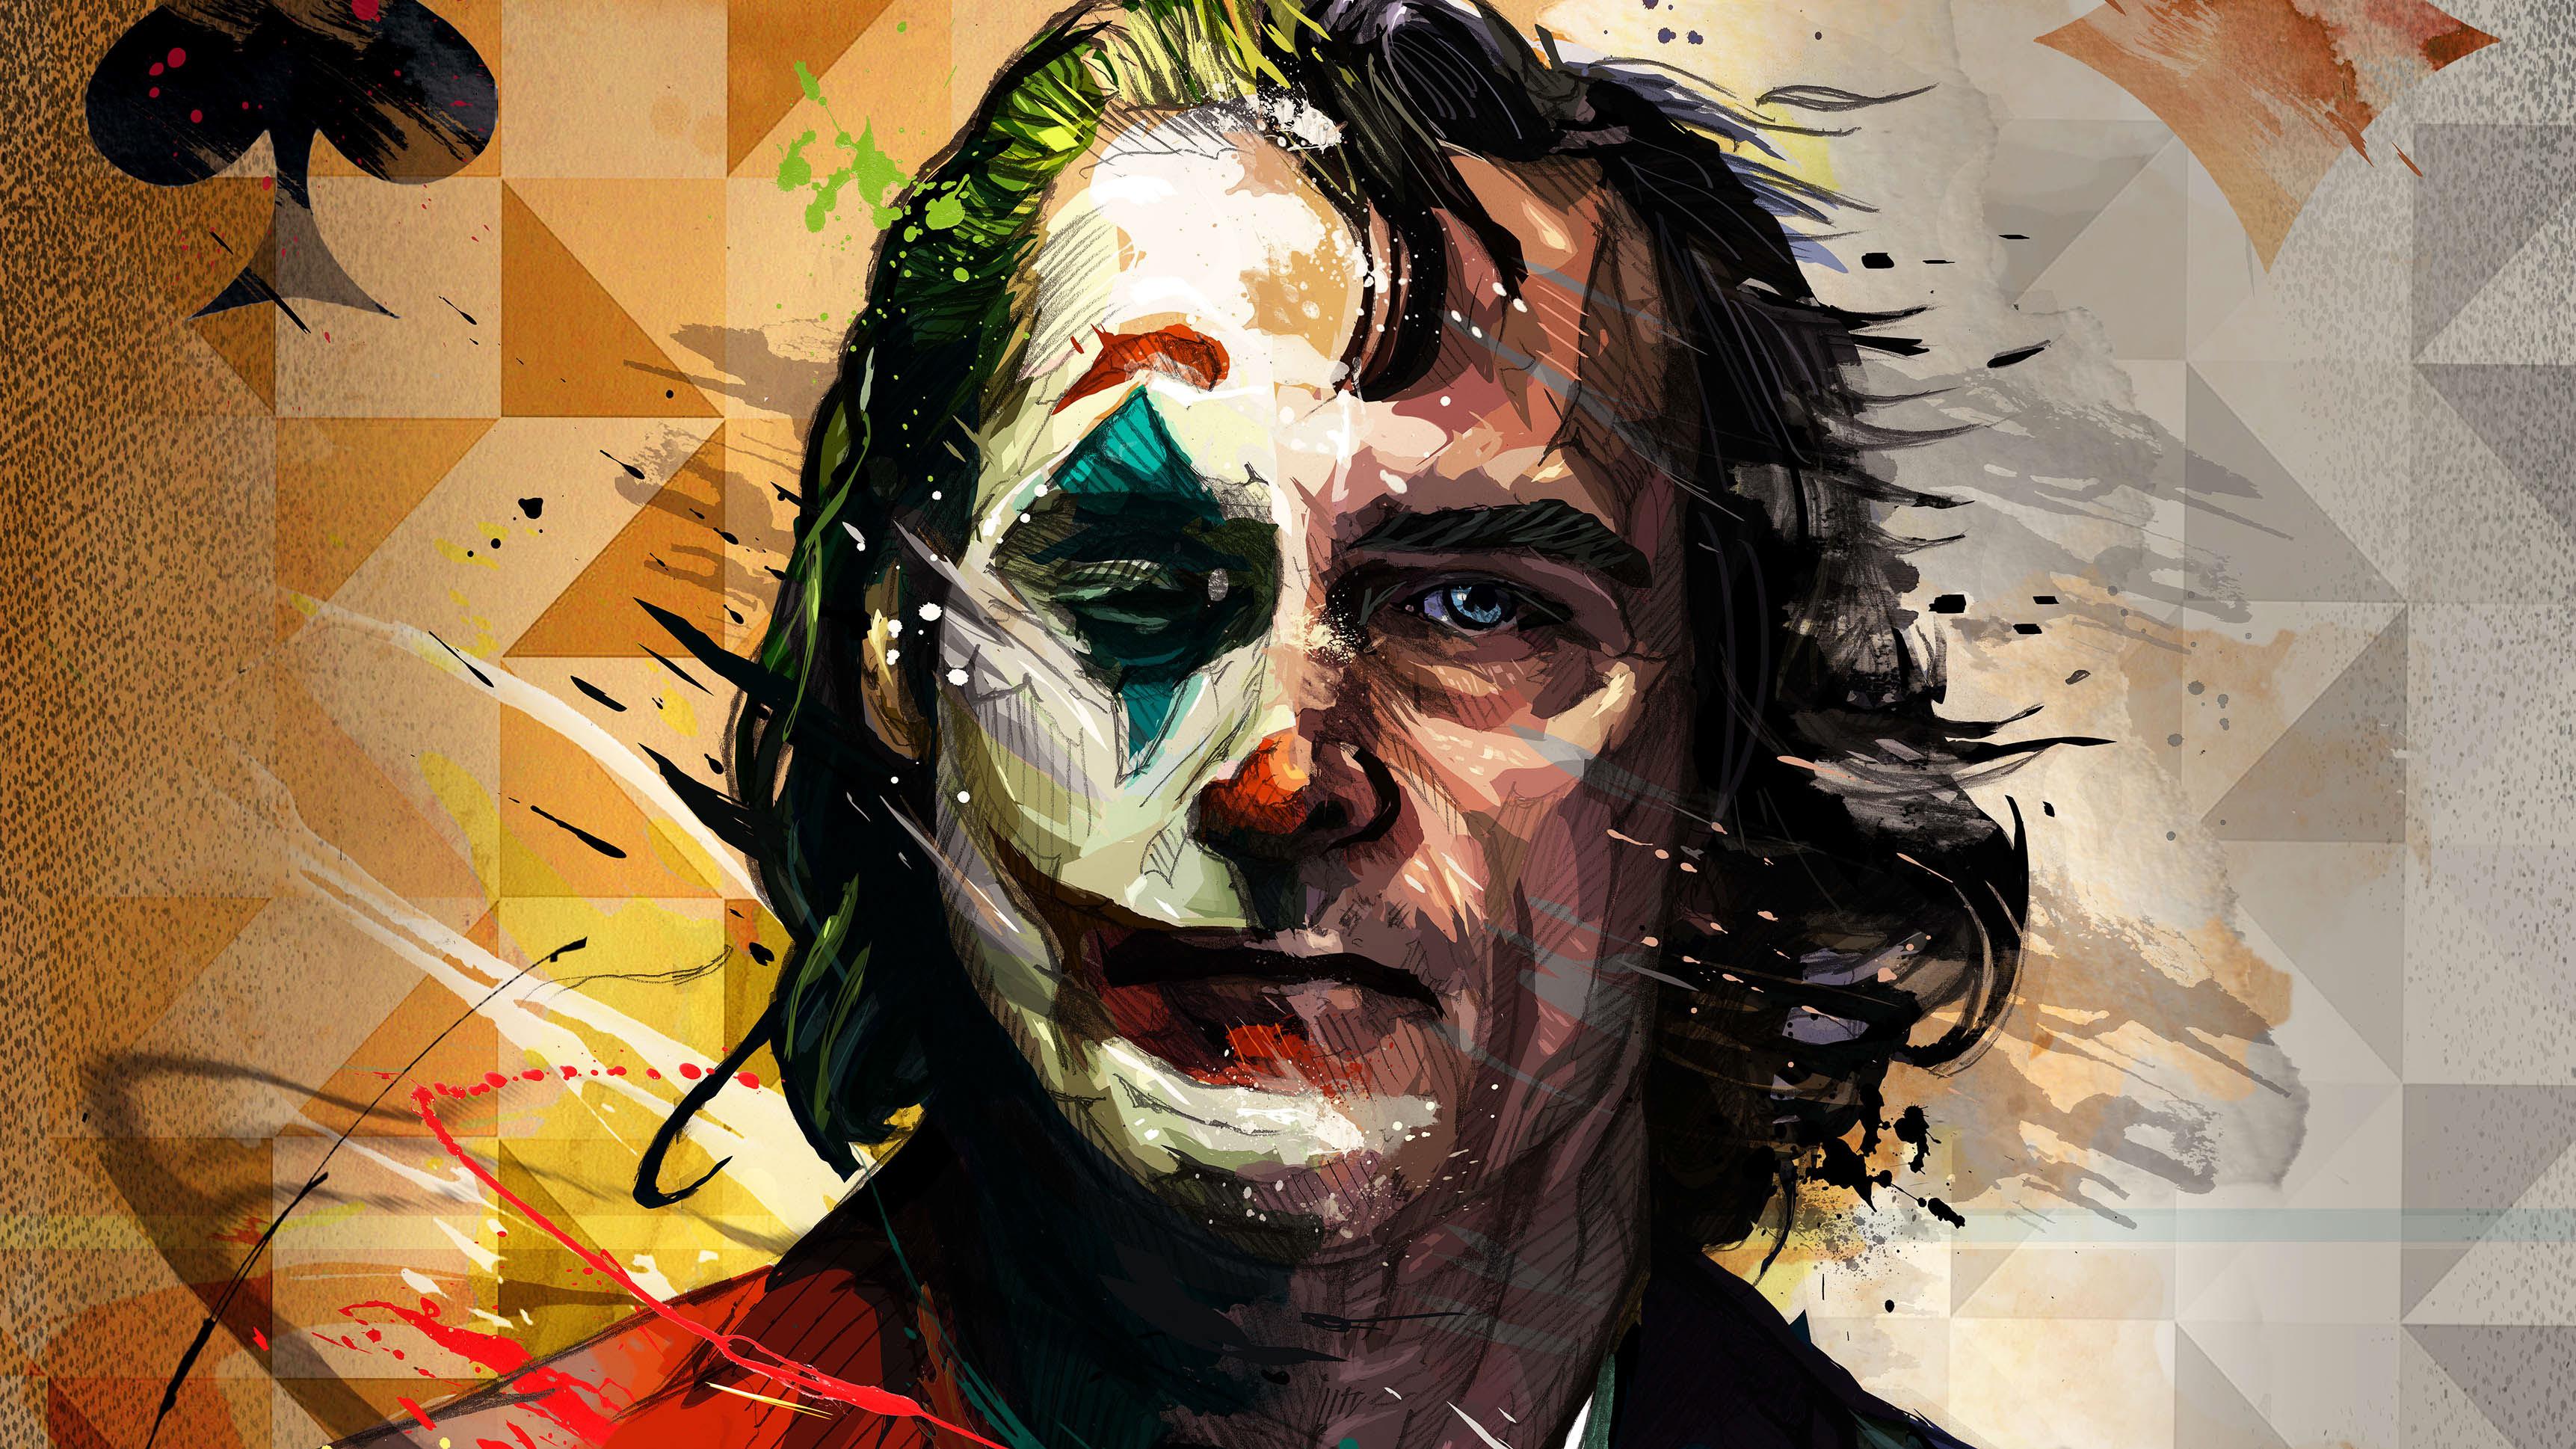 1080x2400 Joaquin Phoenix Joker Artistic 1080x2400